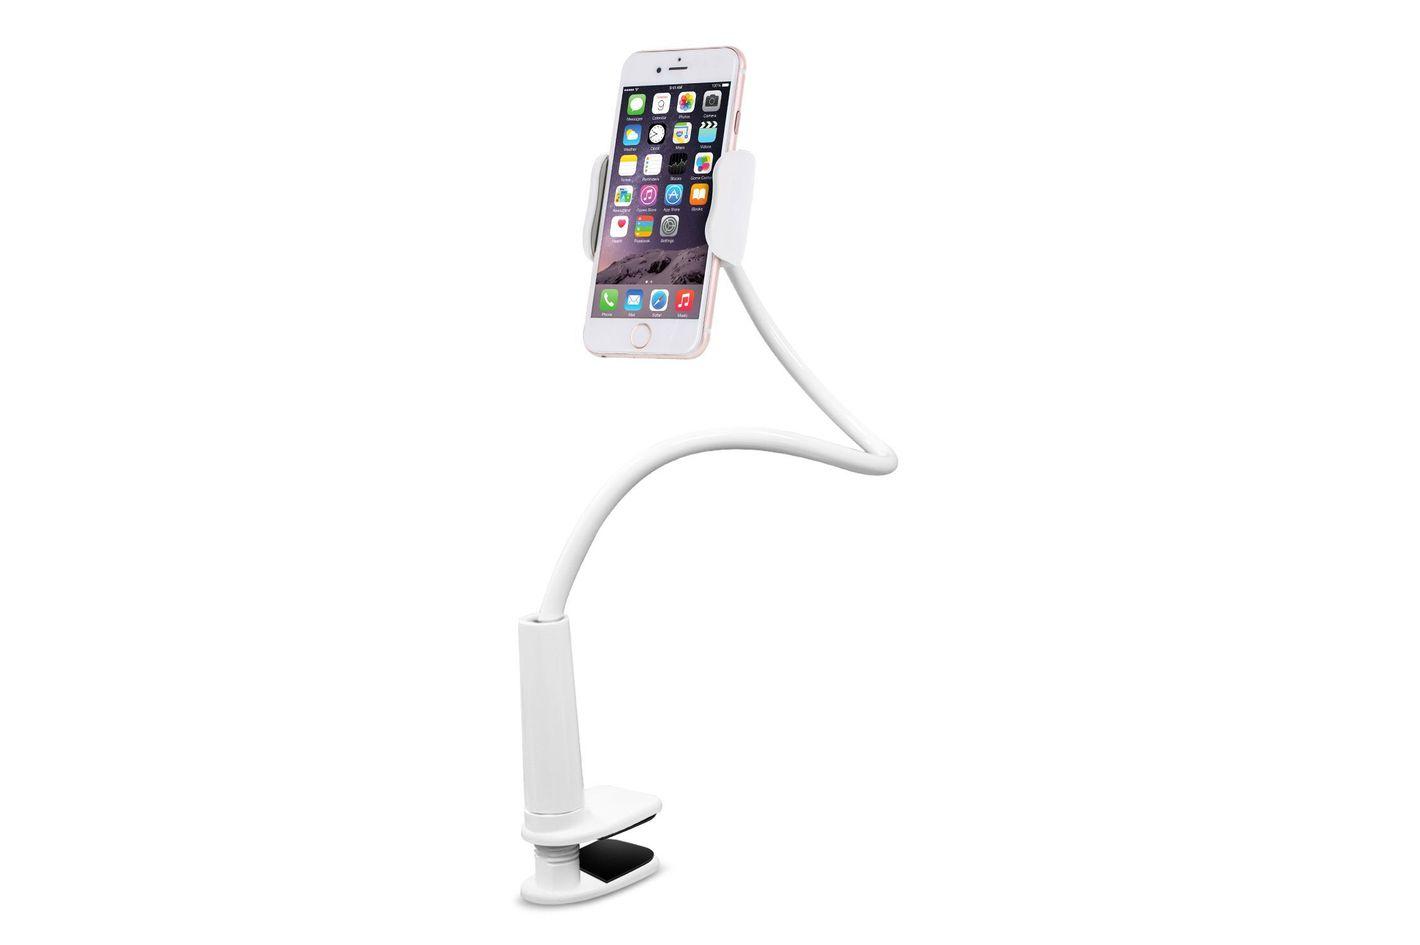 Aduro Solid-Grip 360 Adjustable Universal Gooseneck Smartphone Stand